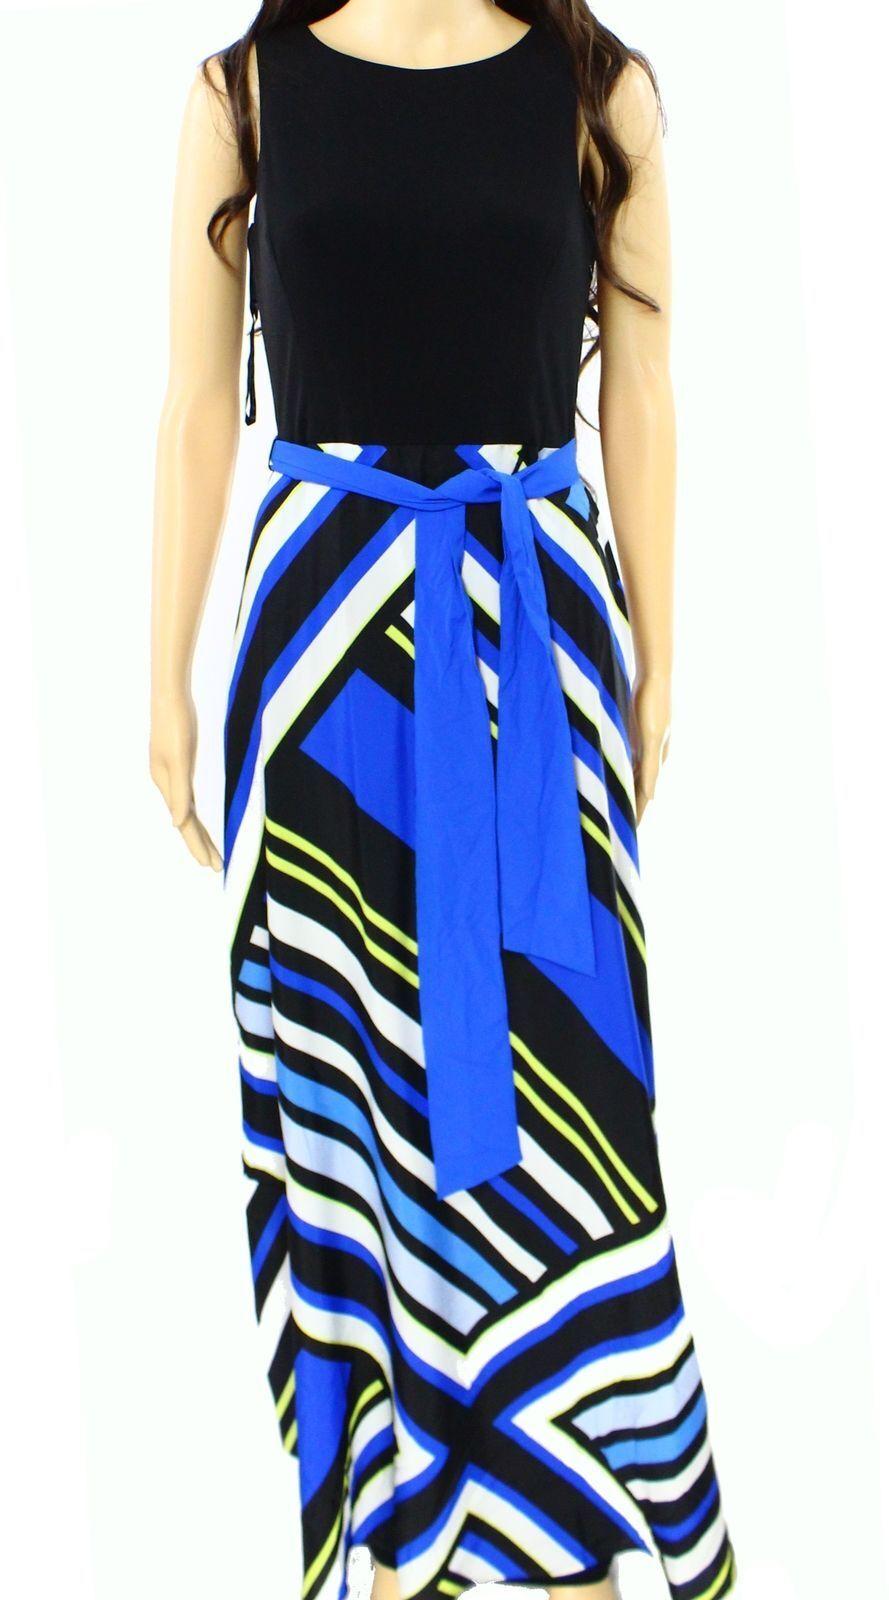 INC International Concepts Women's New Printed Maxi Dress bluee Strip Size 4